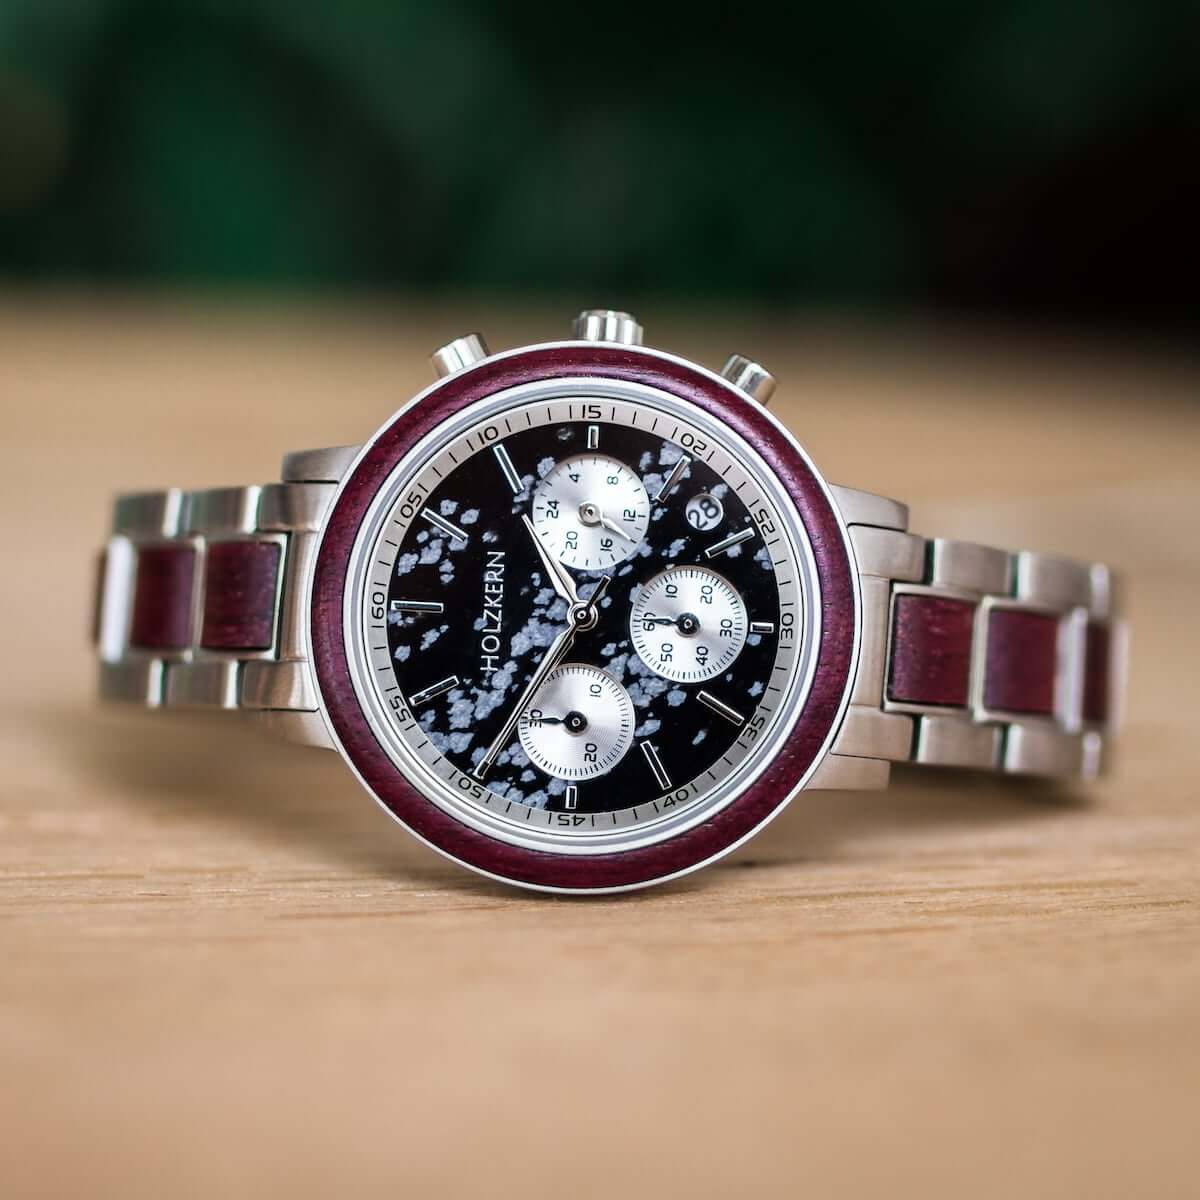 Holzkern Armbanduhr Horizont Schneesturm | Rakuten